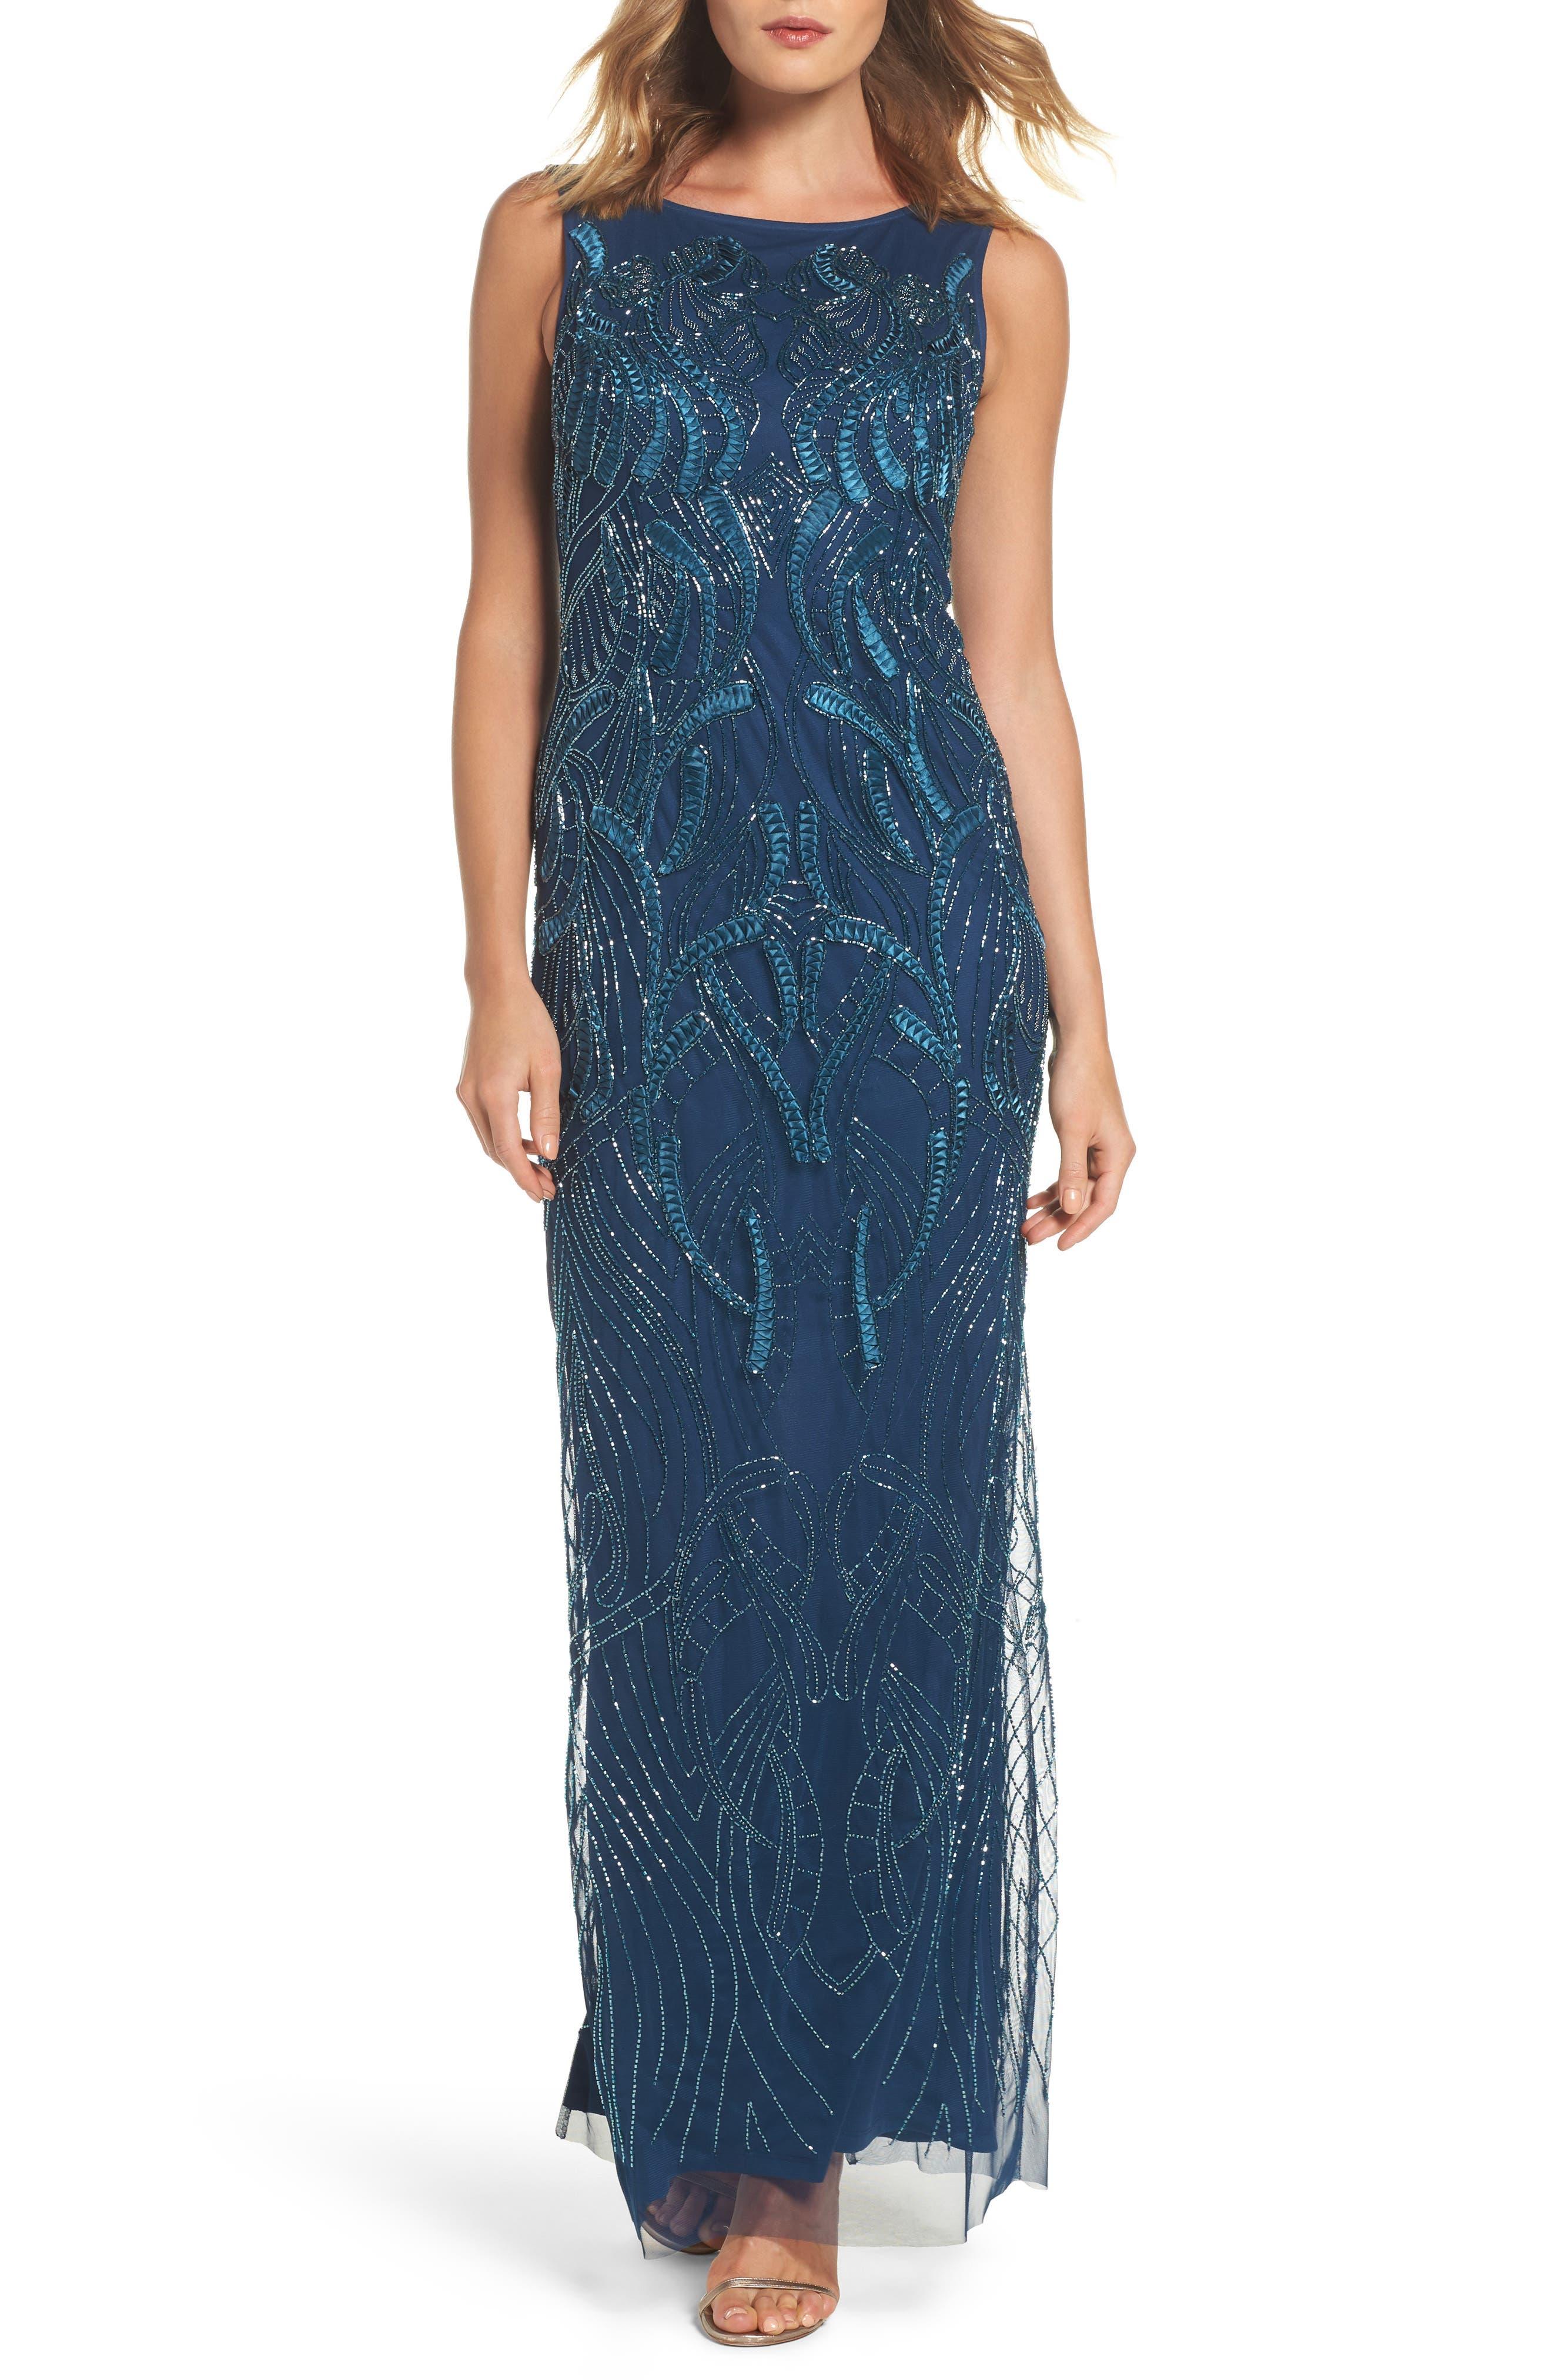 Adrianna Papell Embellished Long Dress (Regular & Petite)